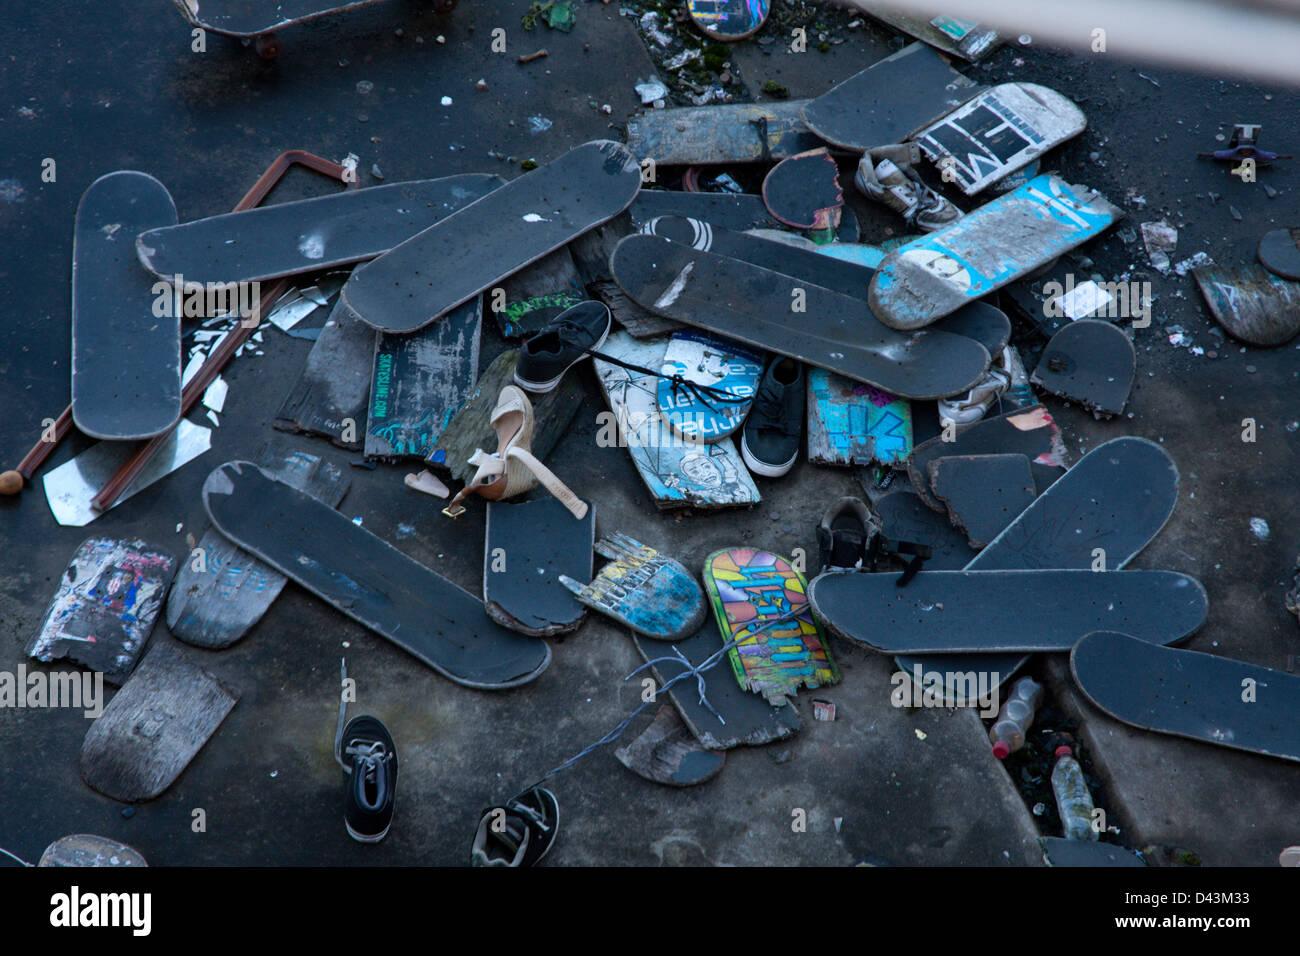 Cimitero di skateboard a Hungerford Bridge, Londra Immagini Stock